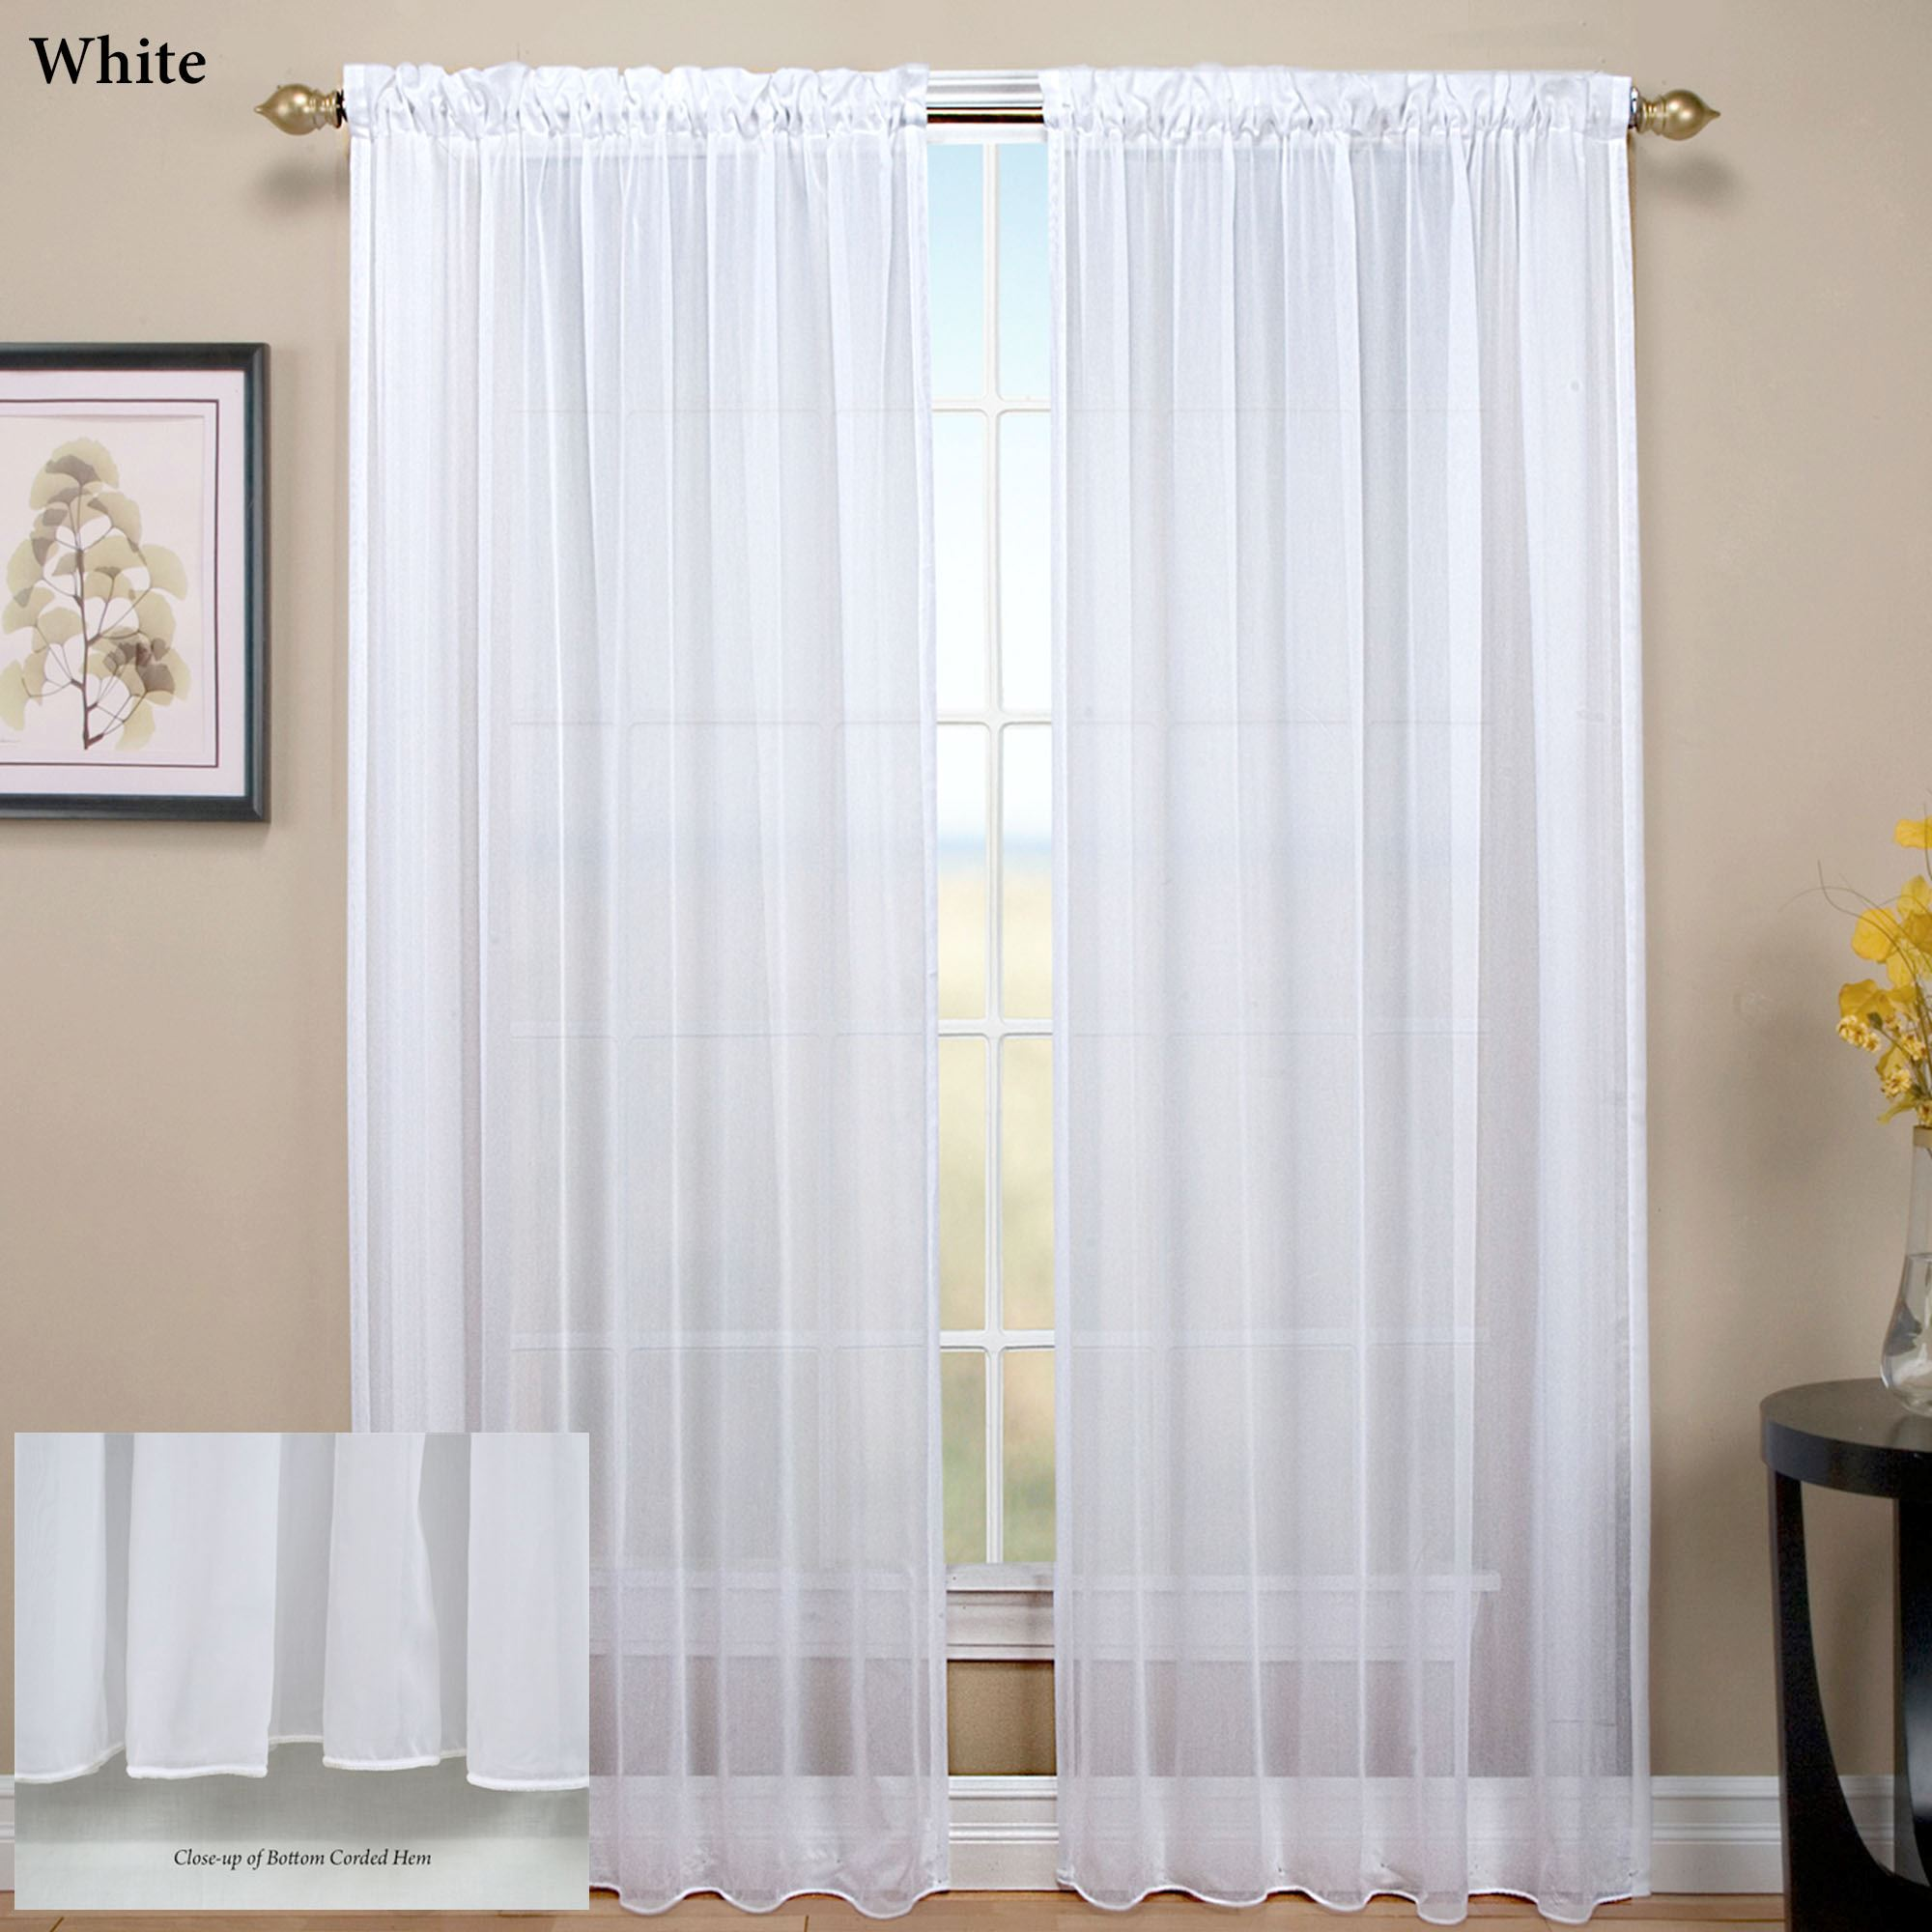 door curtain panel cheaper than retail